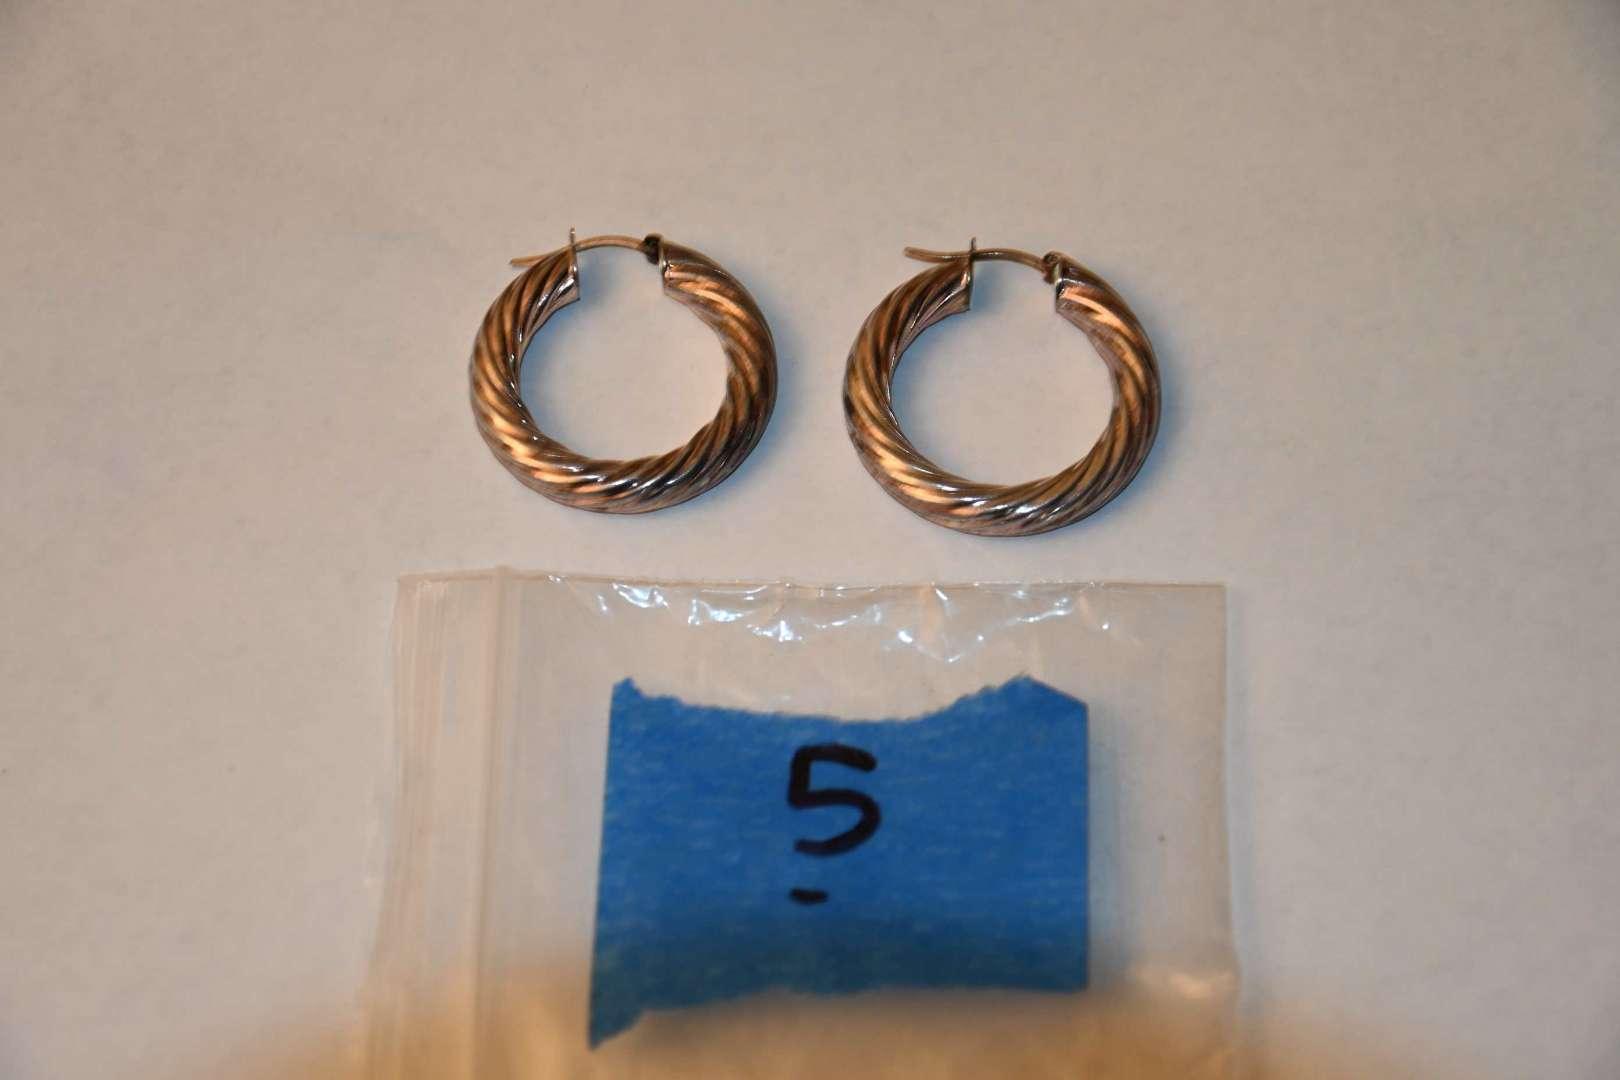 Lot # 5 Sterling silver hoop earrings 11.9g